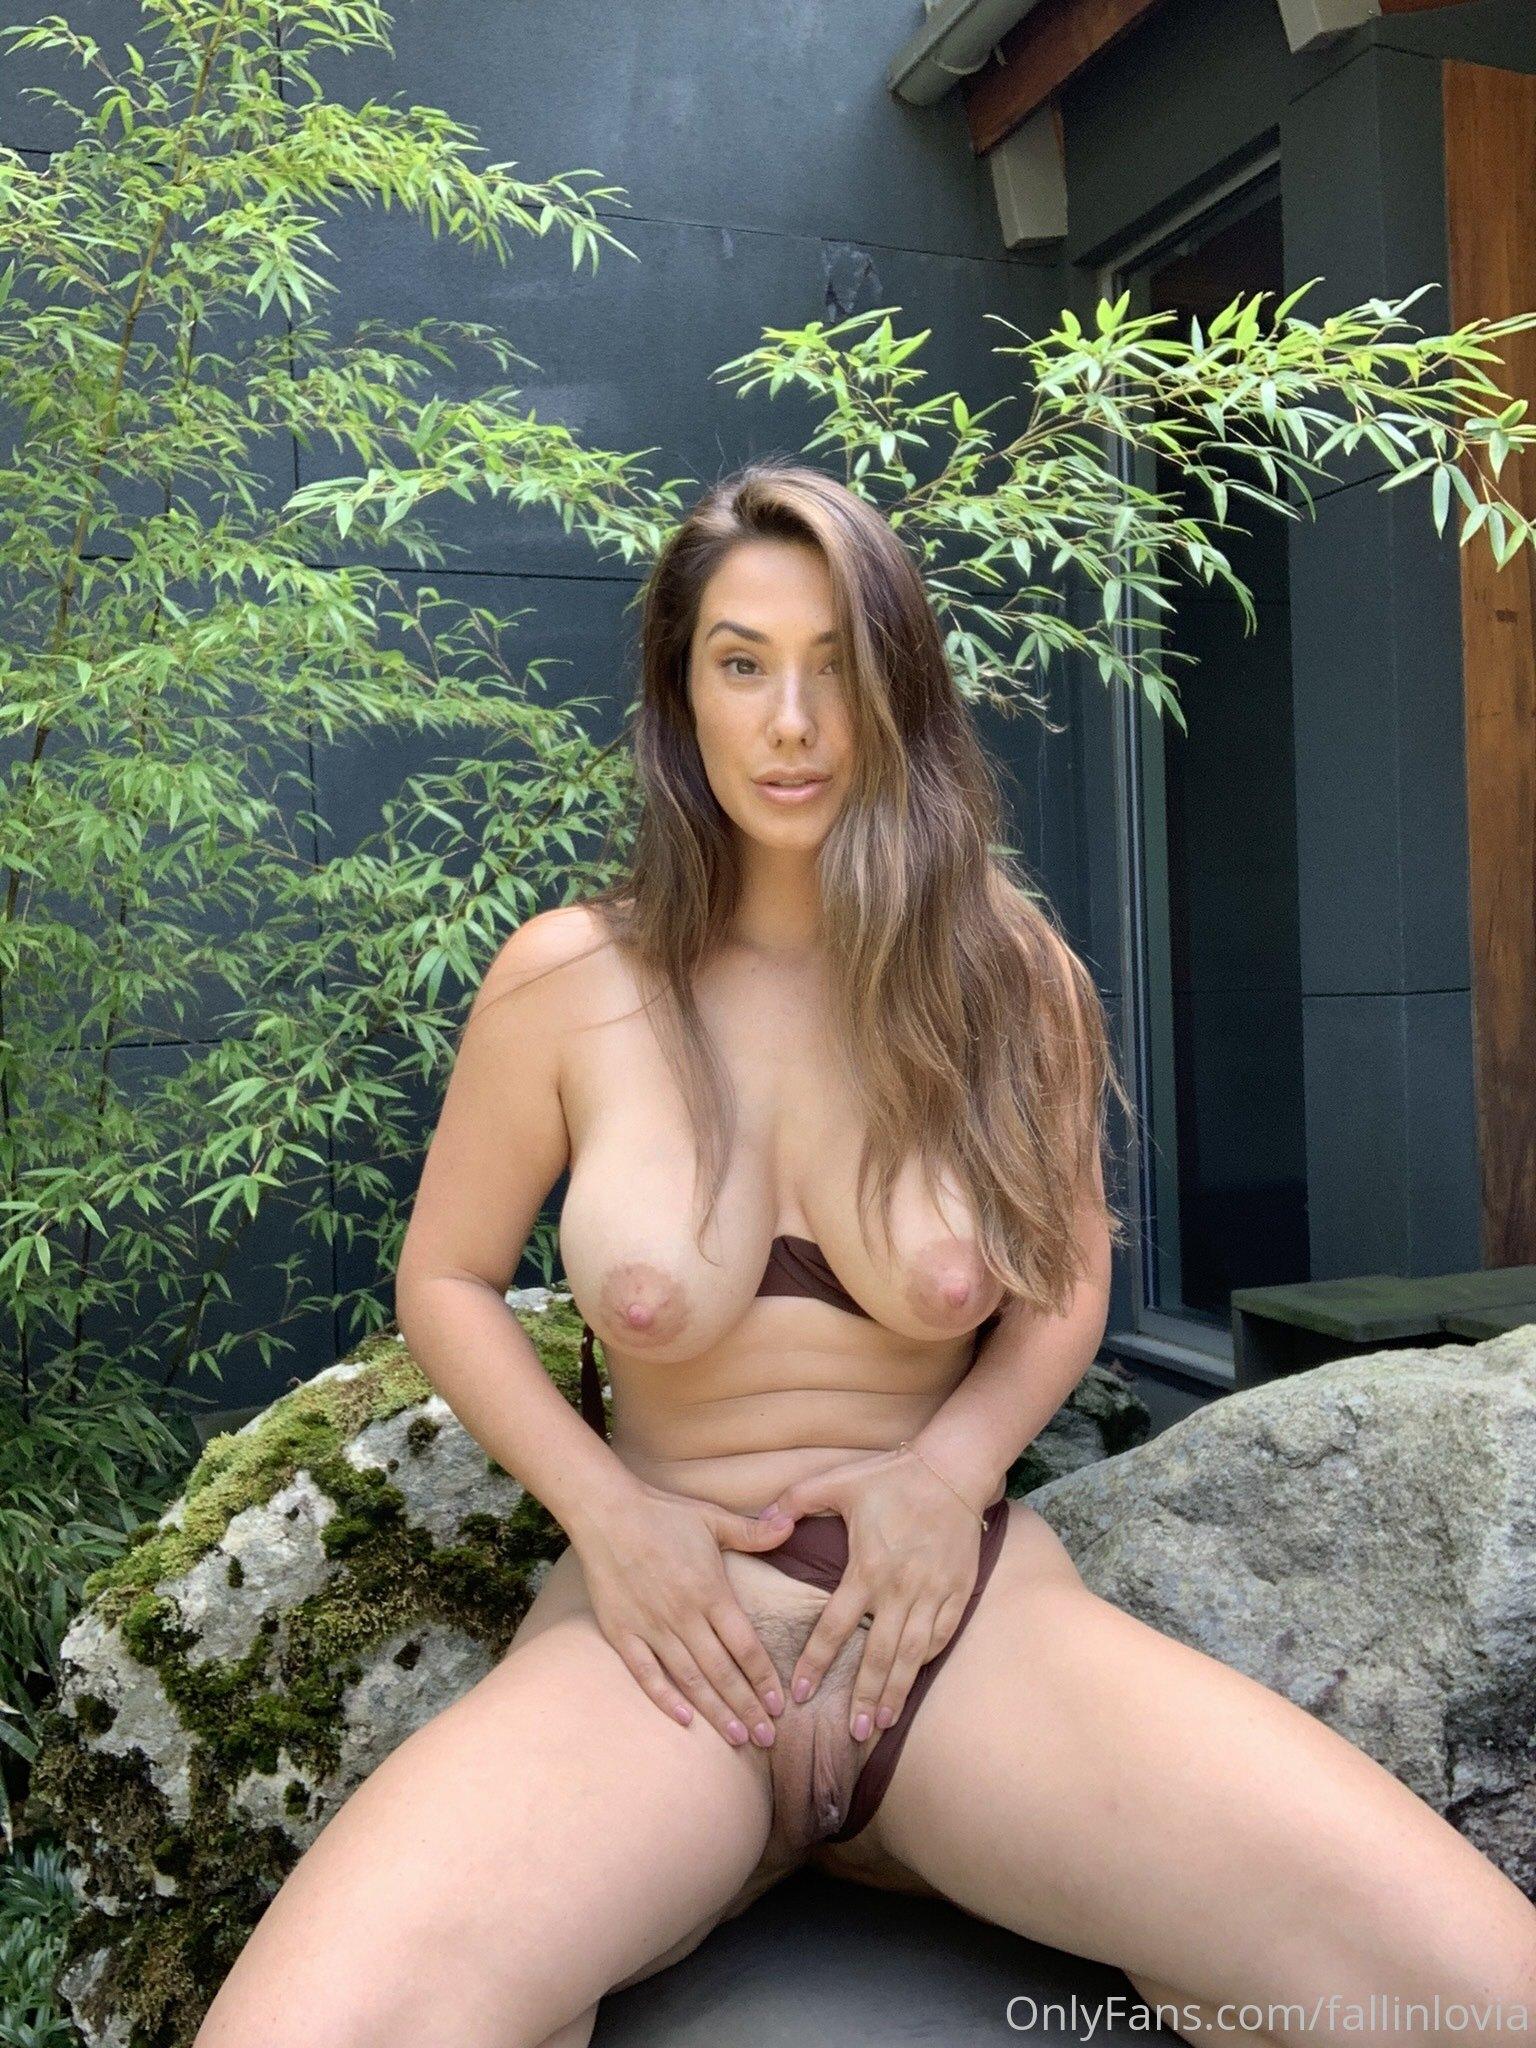 Eva Lovia, Fallinlovia, Onlyfans 0248